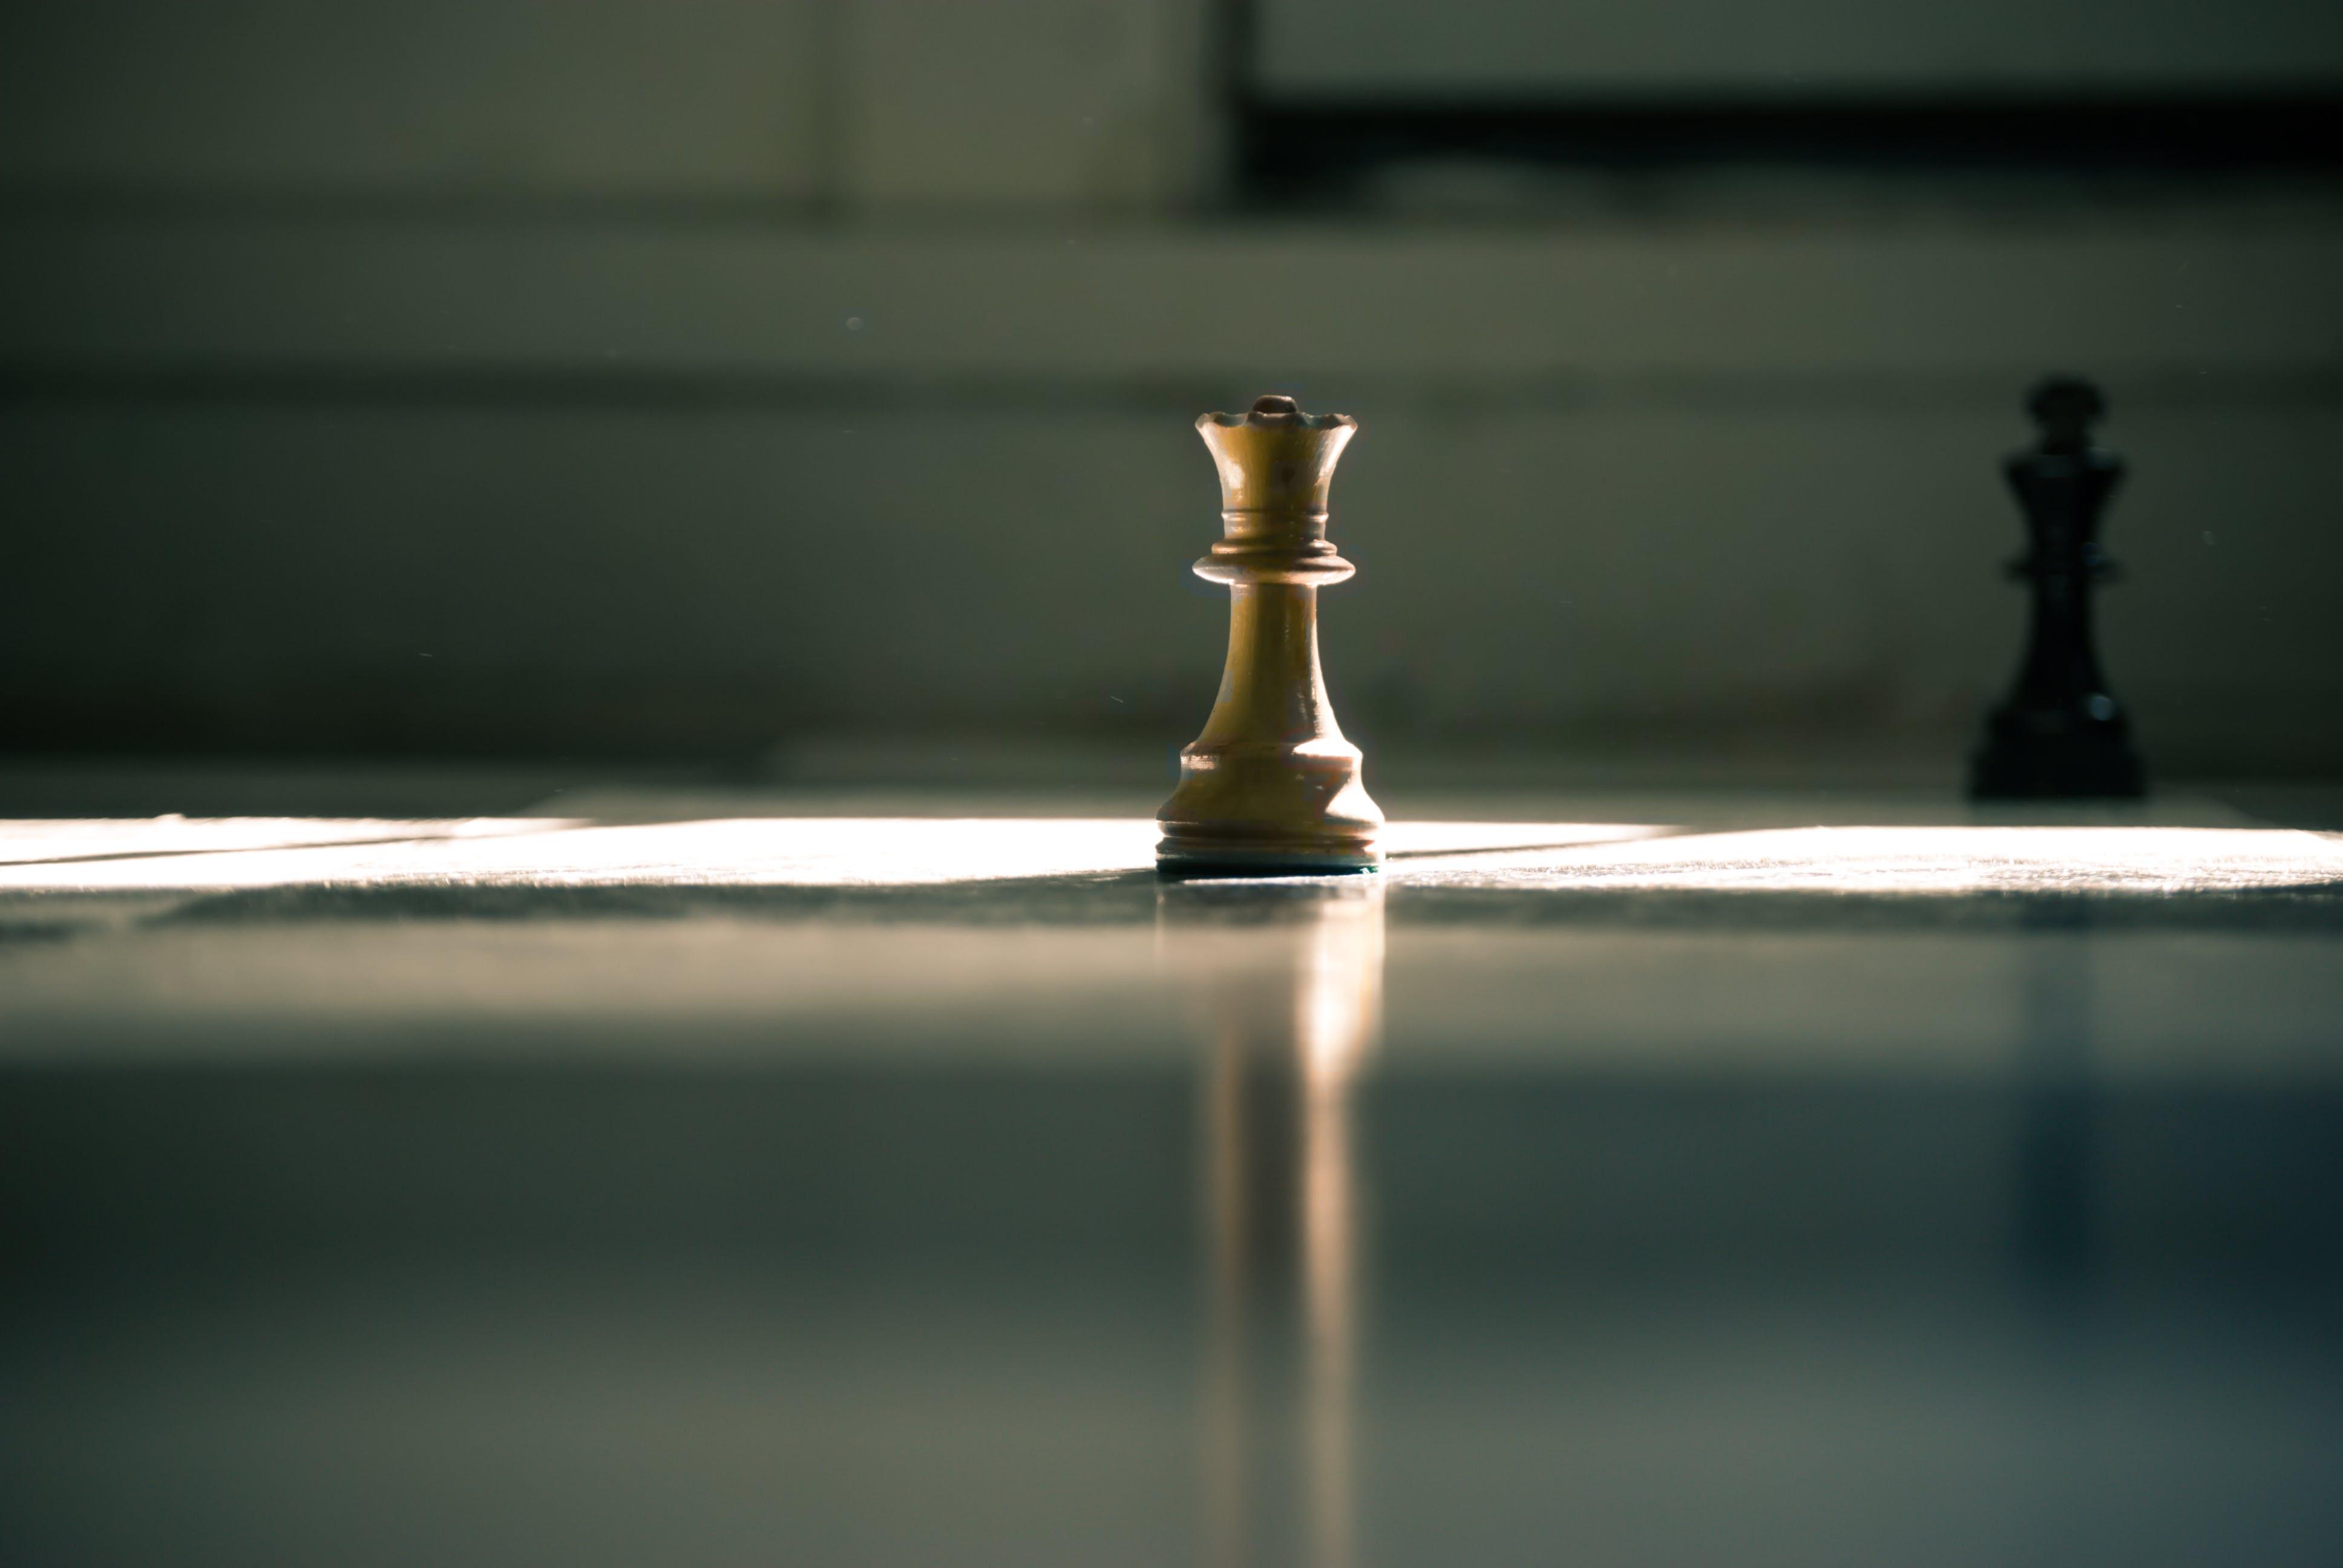 Brown Queen Chess Piece